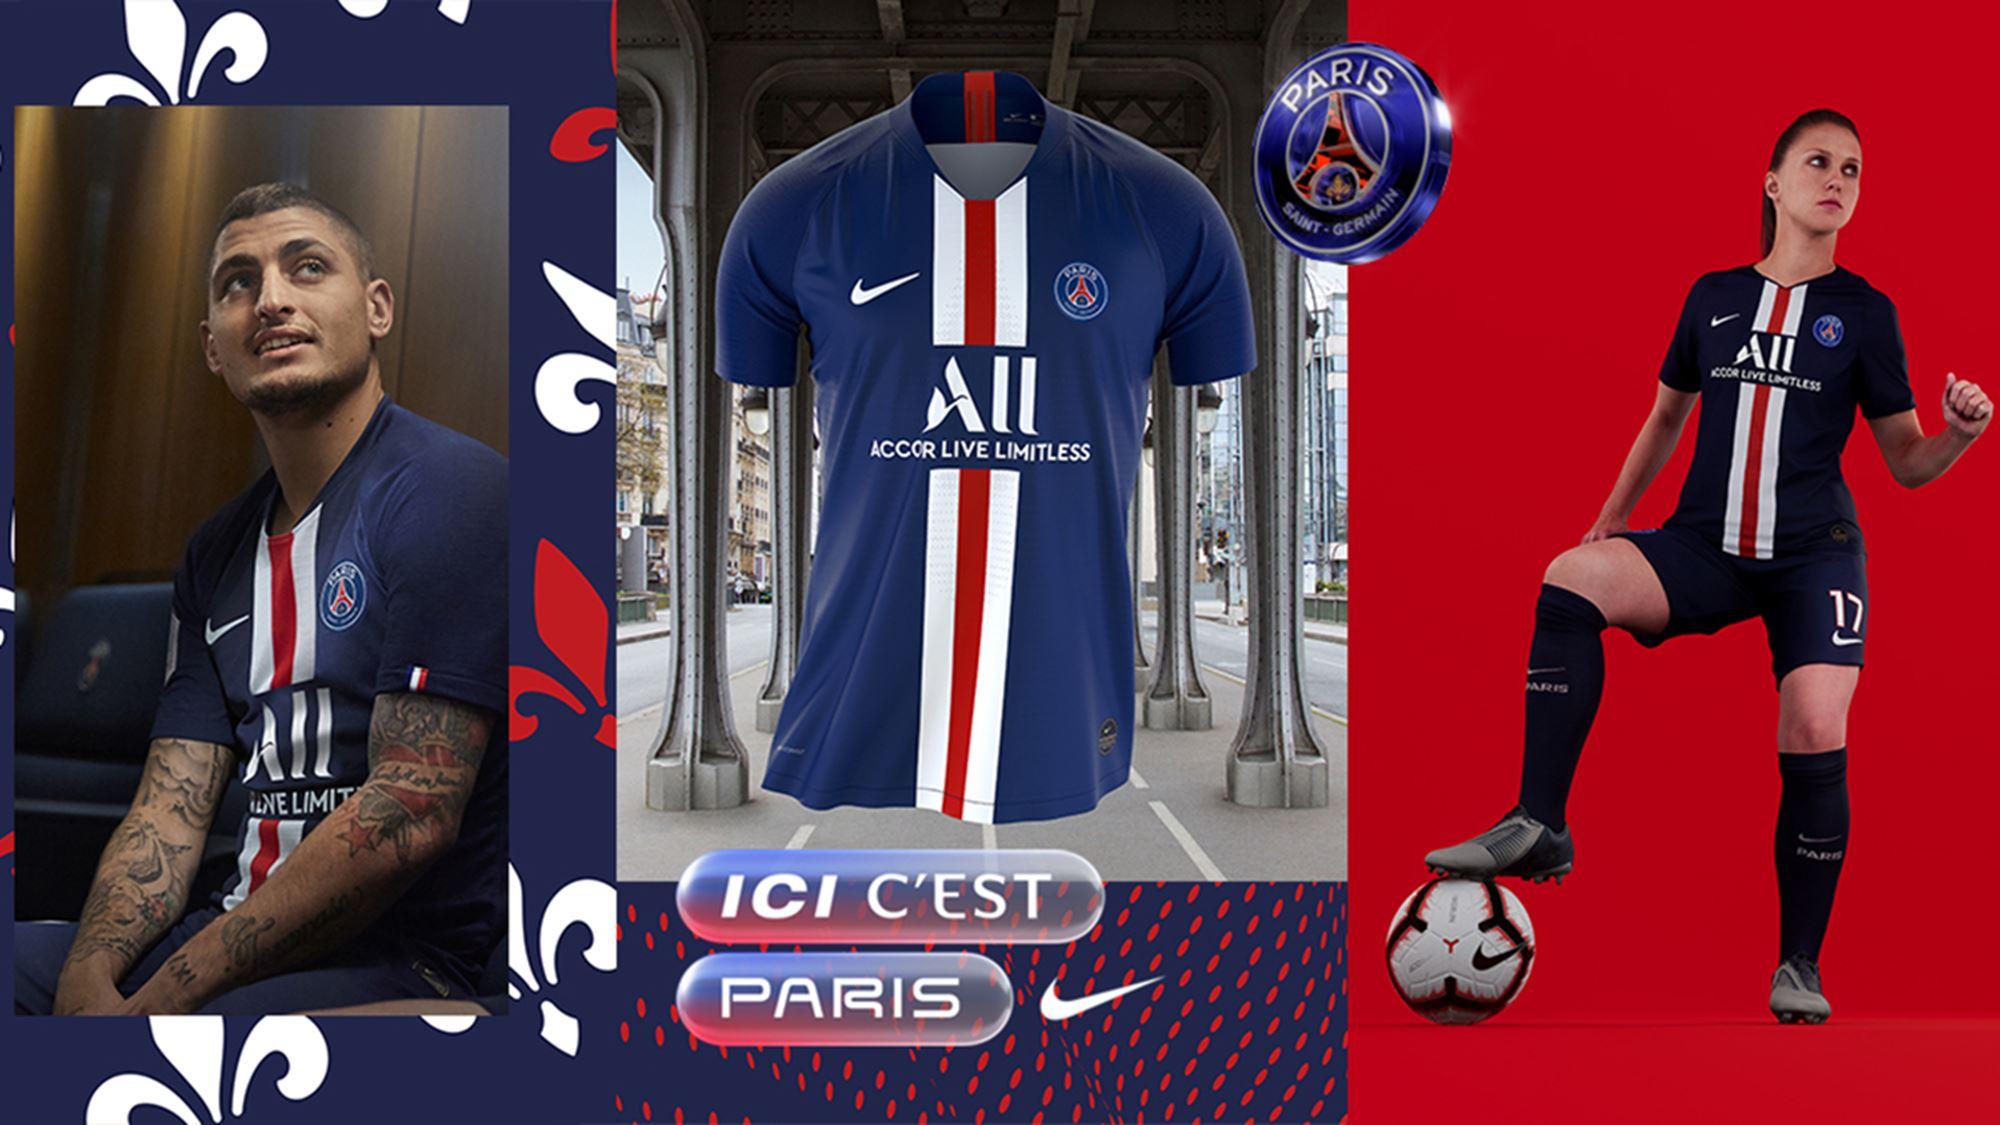 low priced 501df 4bb53 Paris Saint-Germain 2019/20 Nike Home Kit - FOOTBALL FASHION.ORG